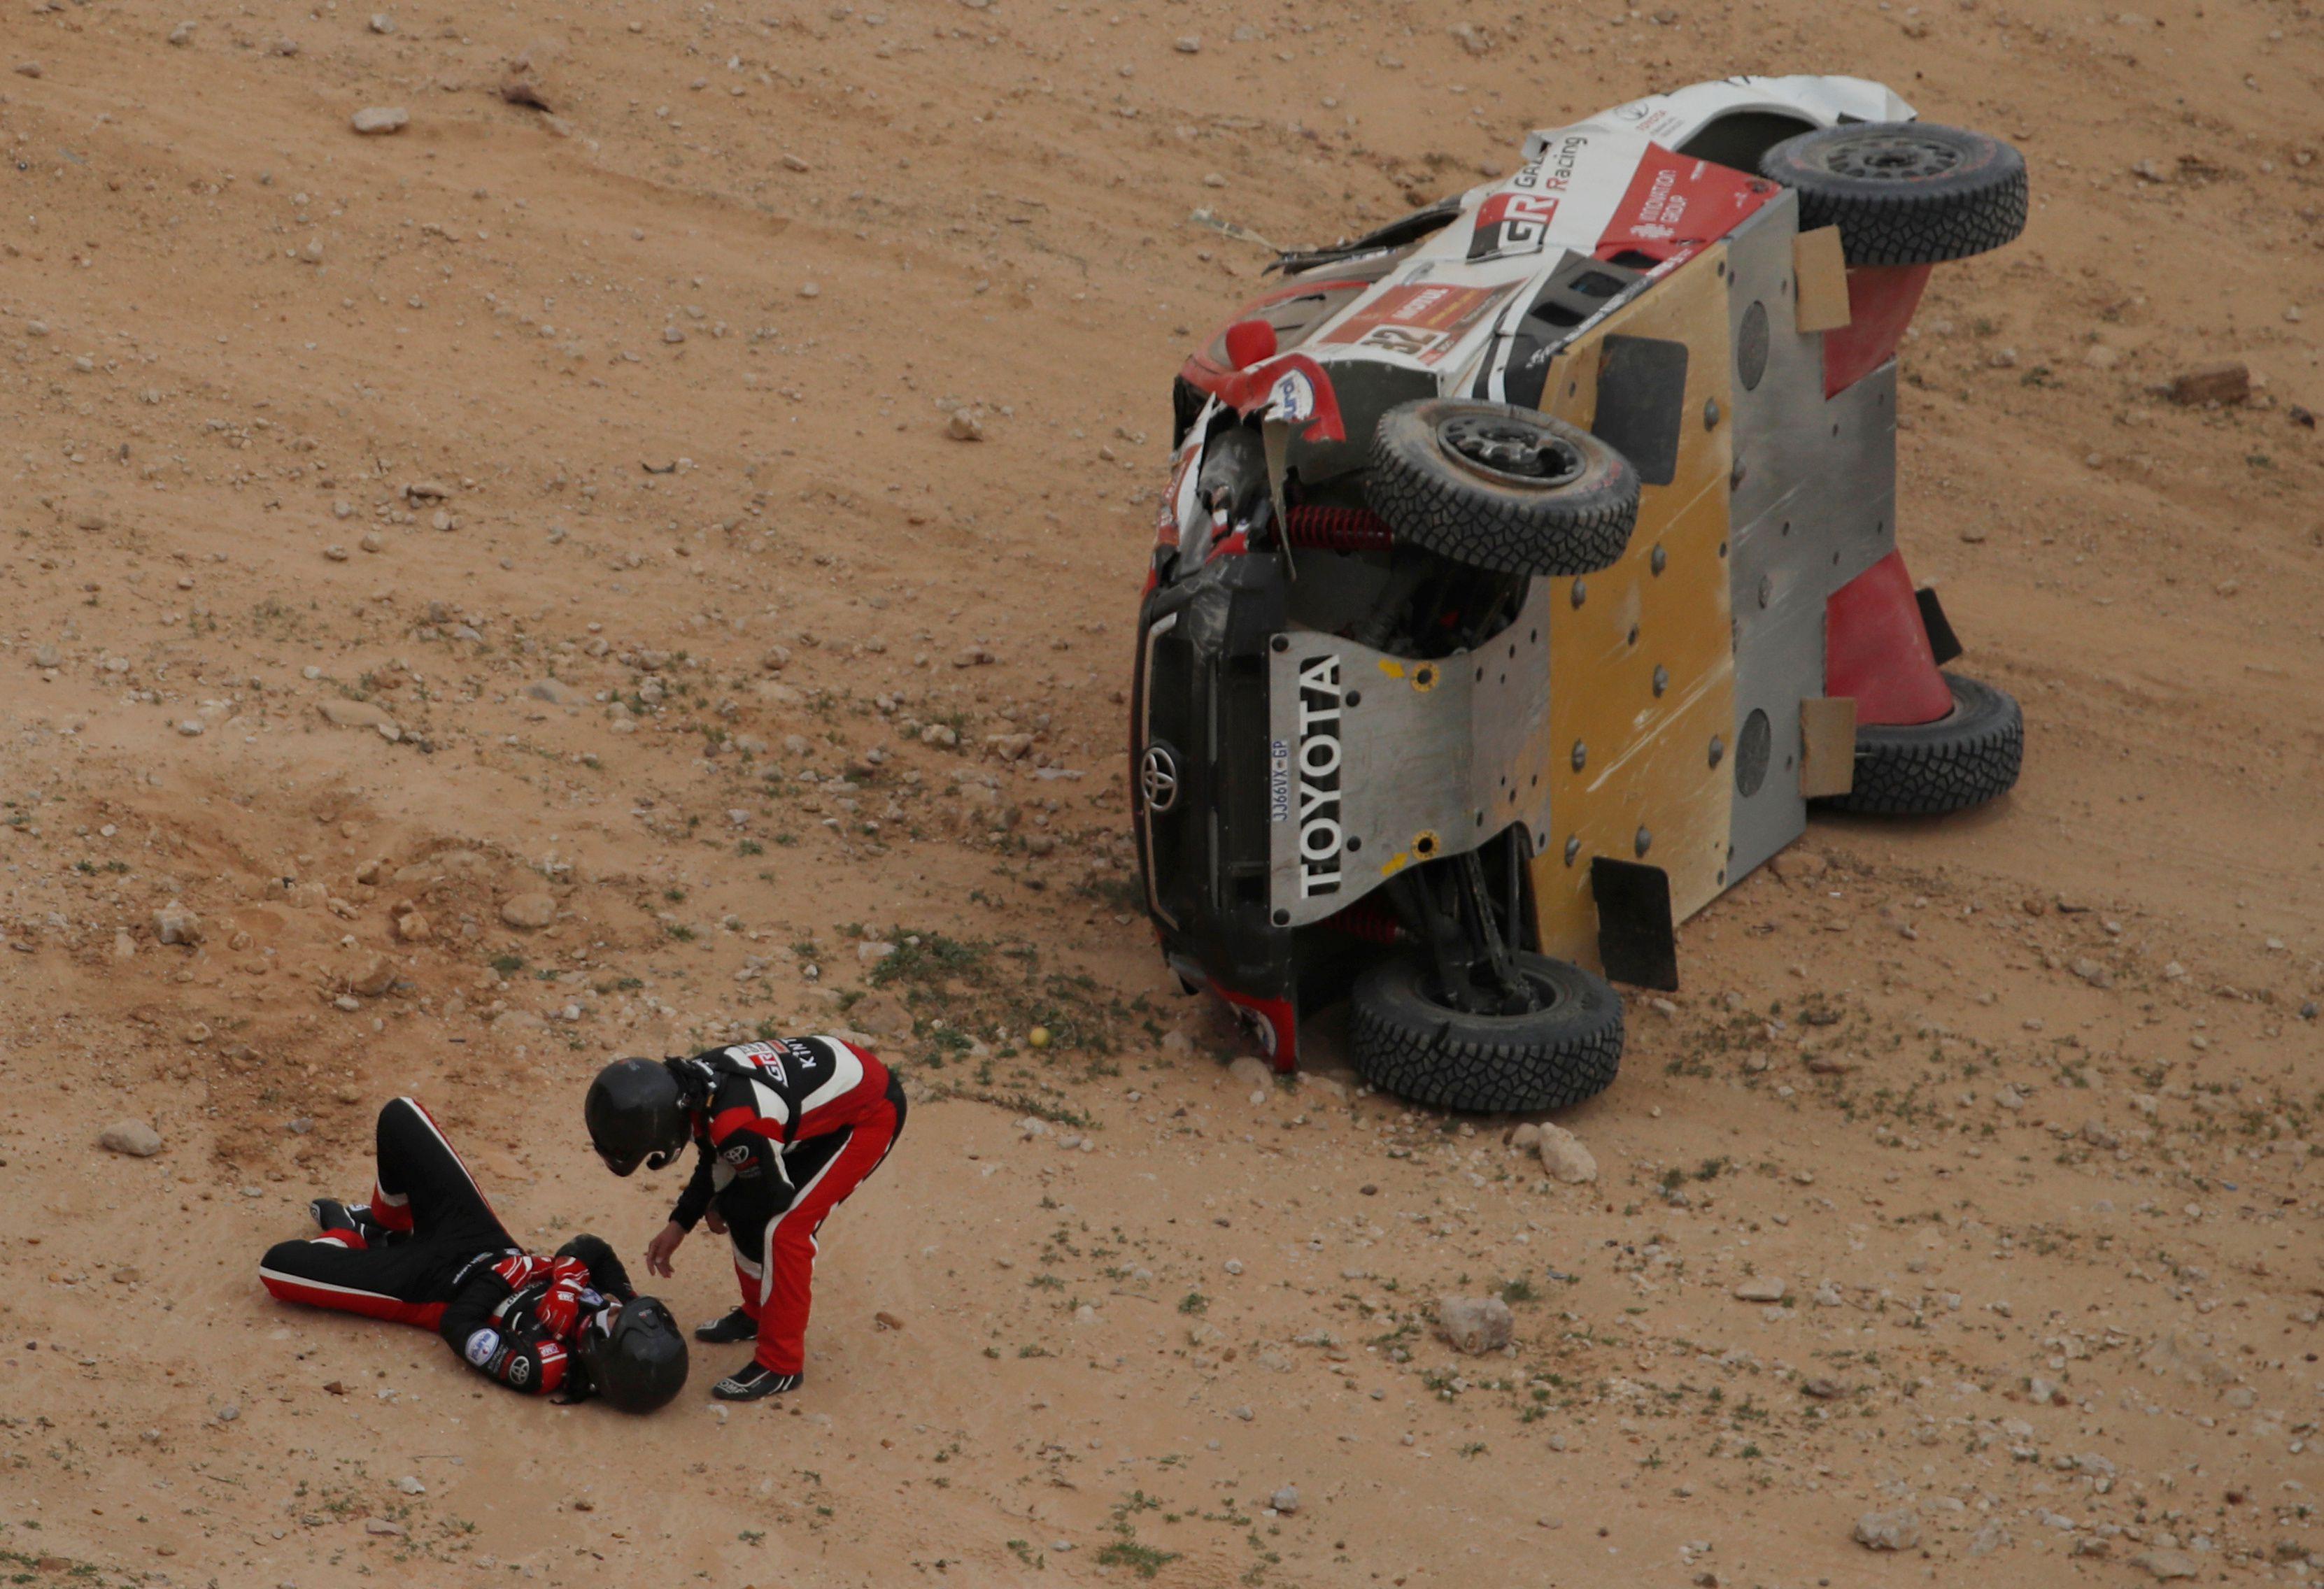 Henk Lategan y Brett luego del accidente sufrido a bordo de su Toyota. Foto: REUTERS/Hamad I Mohammed TPX IMAGES OF THE DAY